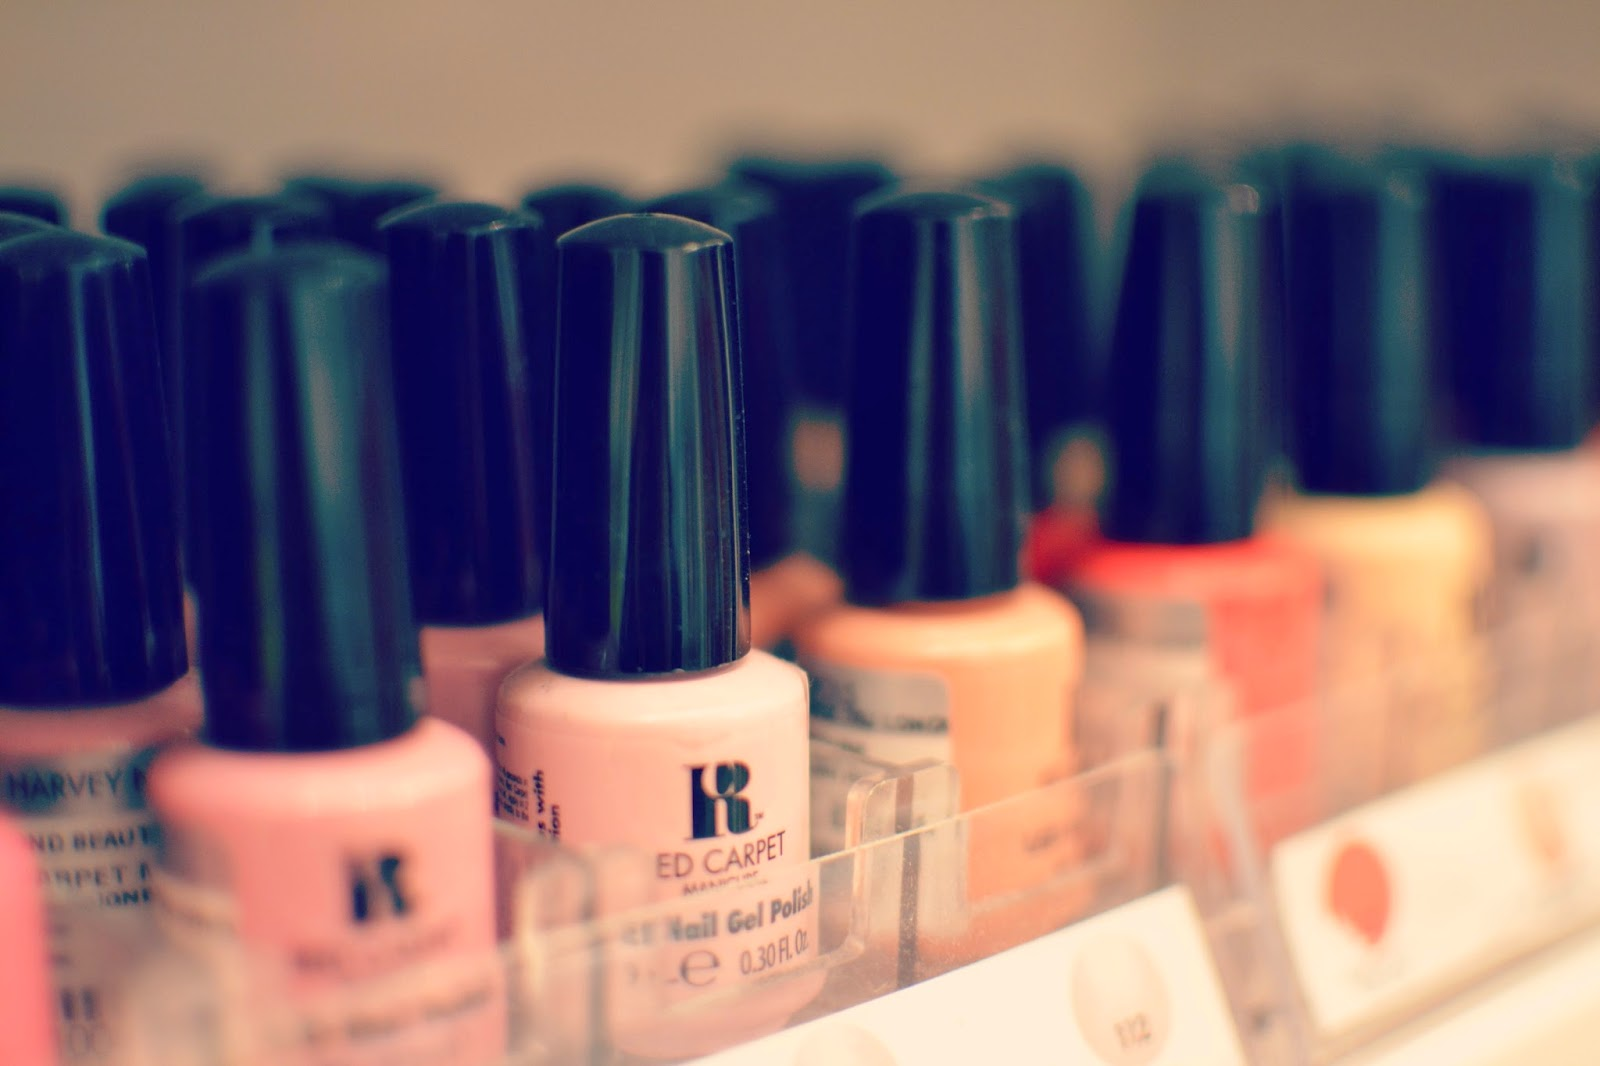 red carpet gel  nail polish